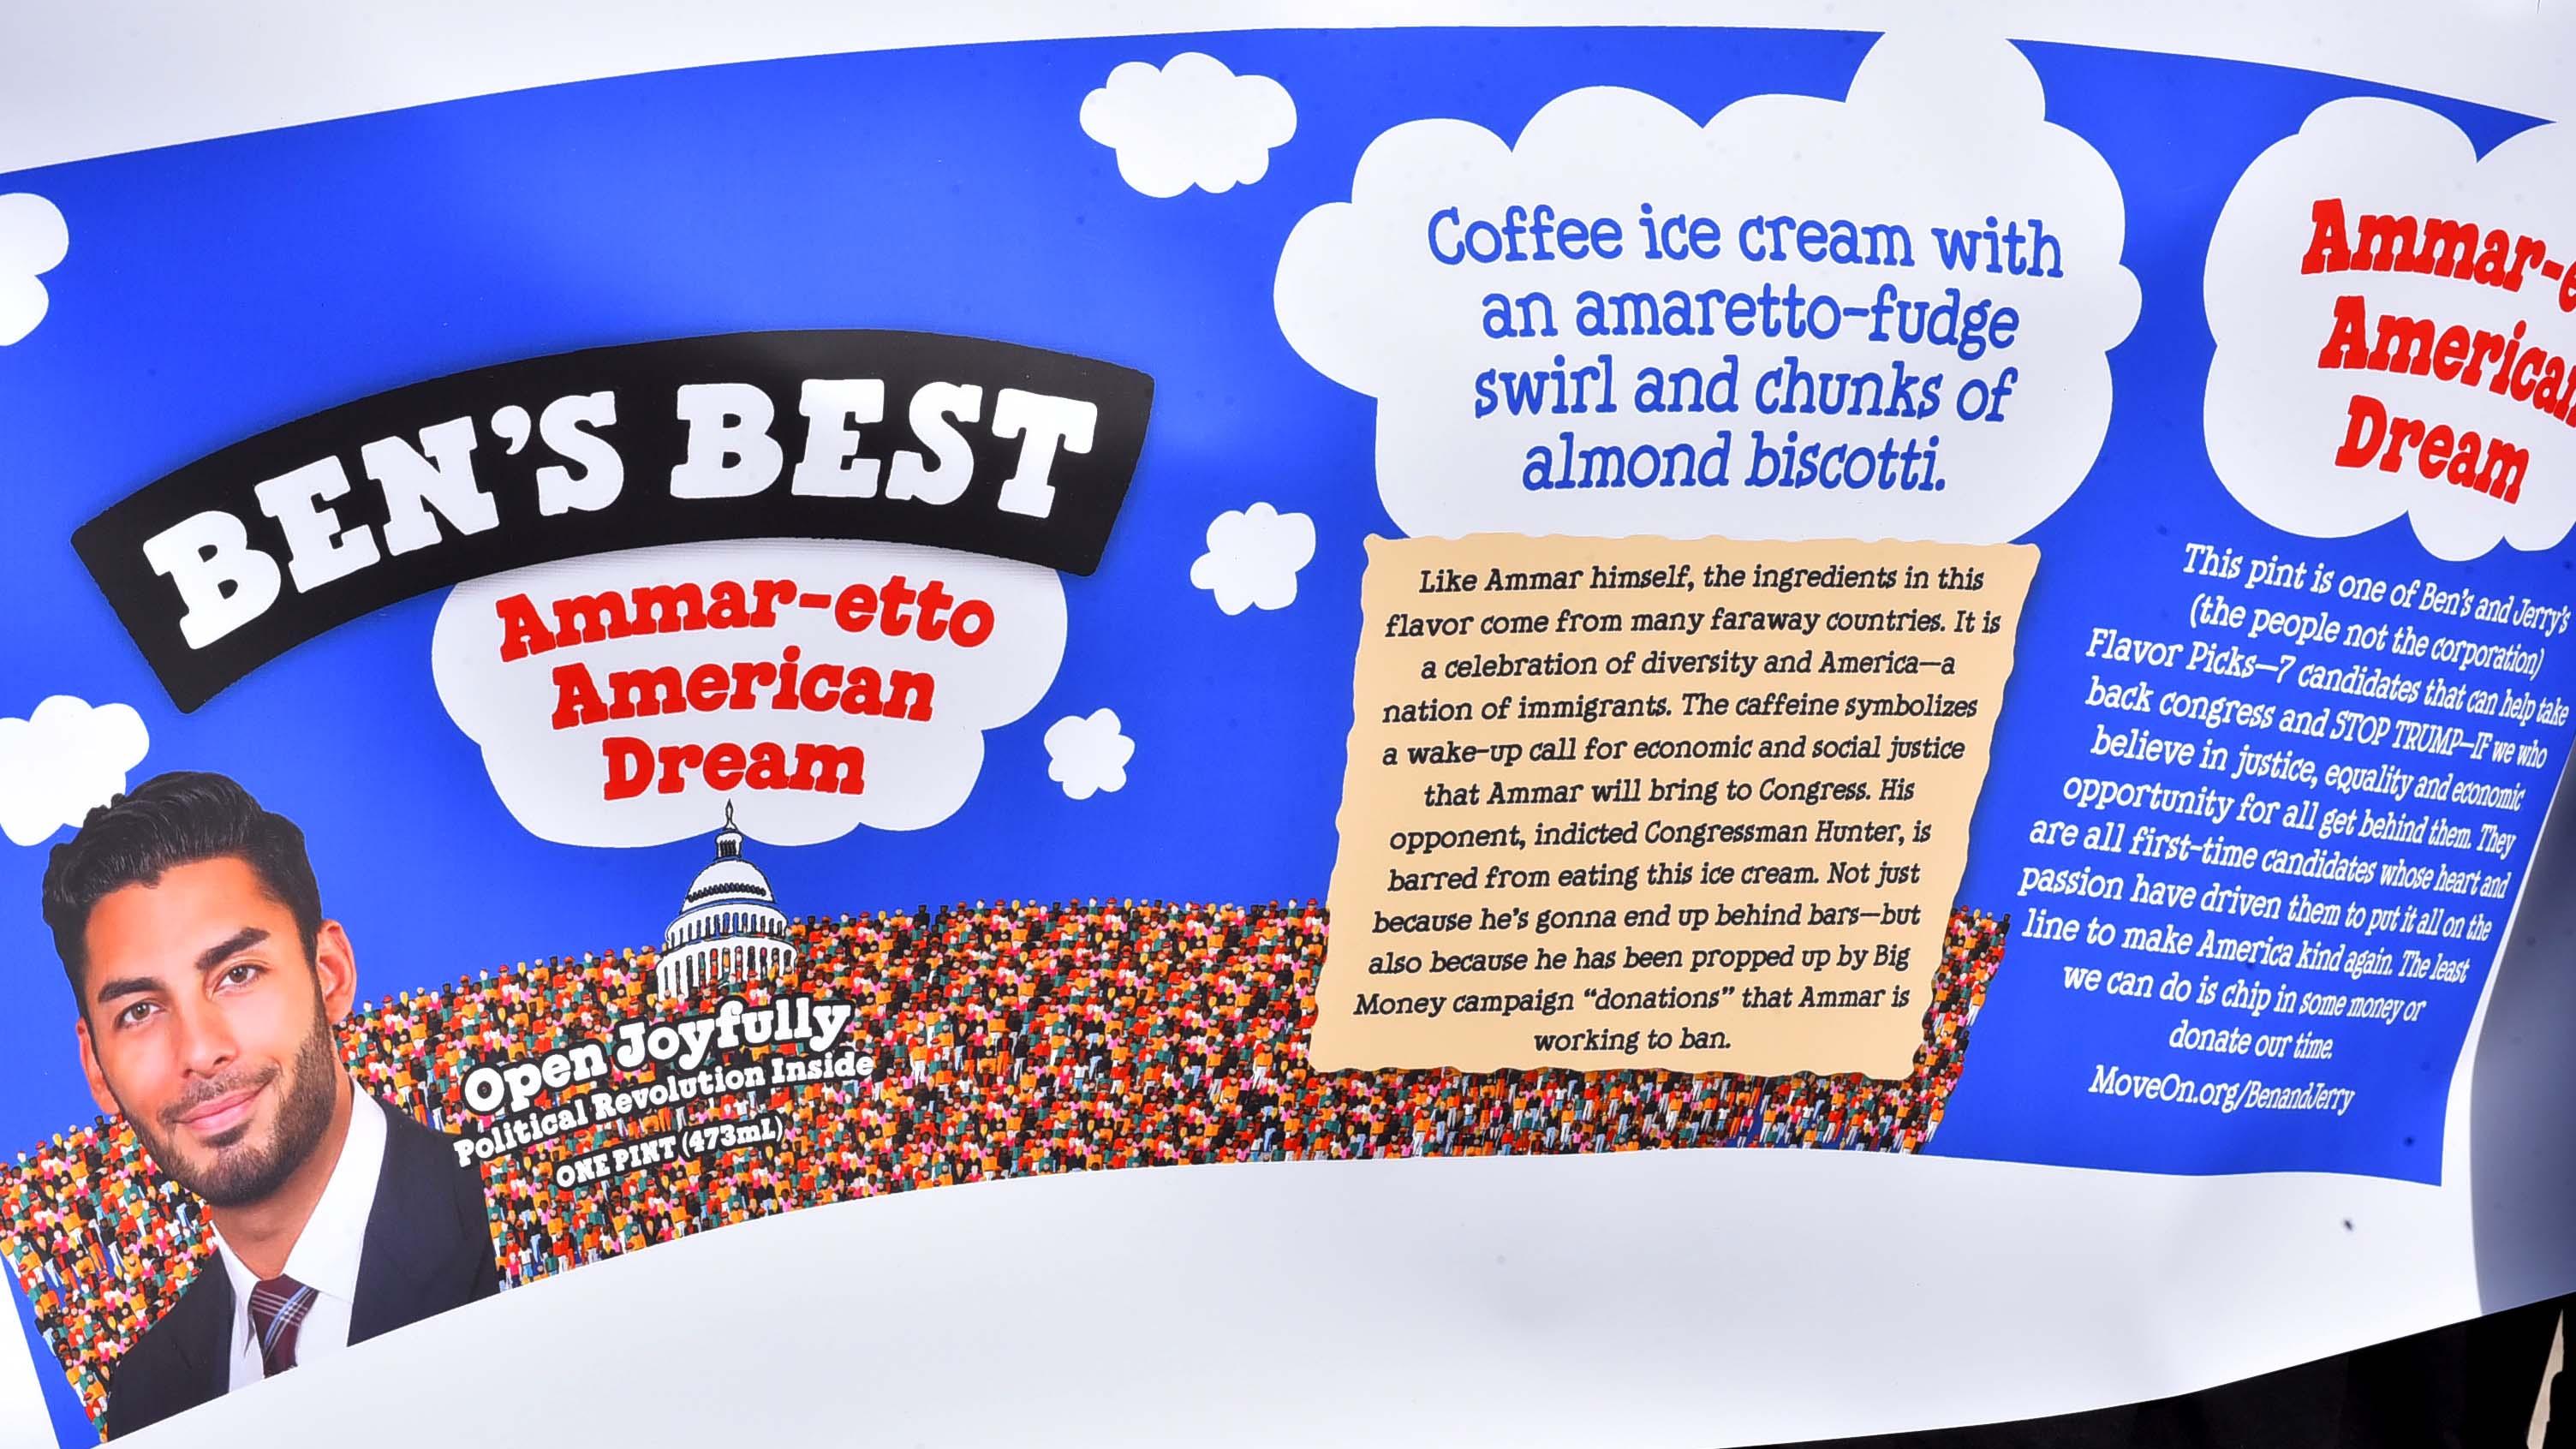 The custom ice cream flavor for Campa-Nijjar, under the label Ben's Best, contains amaretto-fudge, biscotti and coffee.